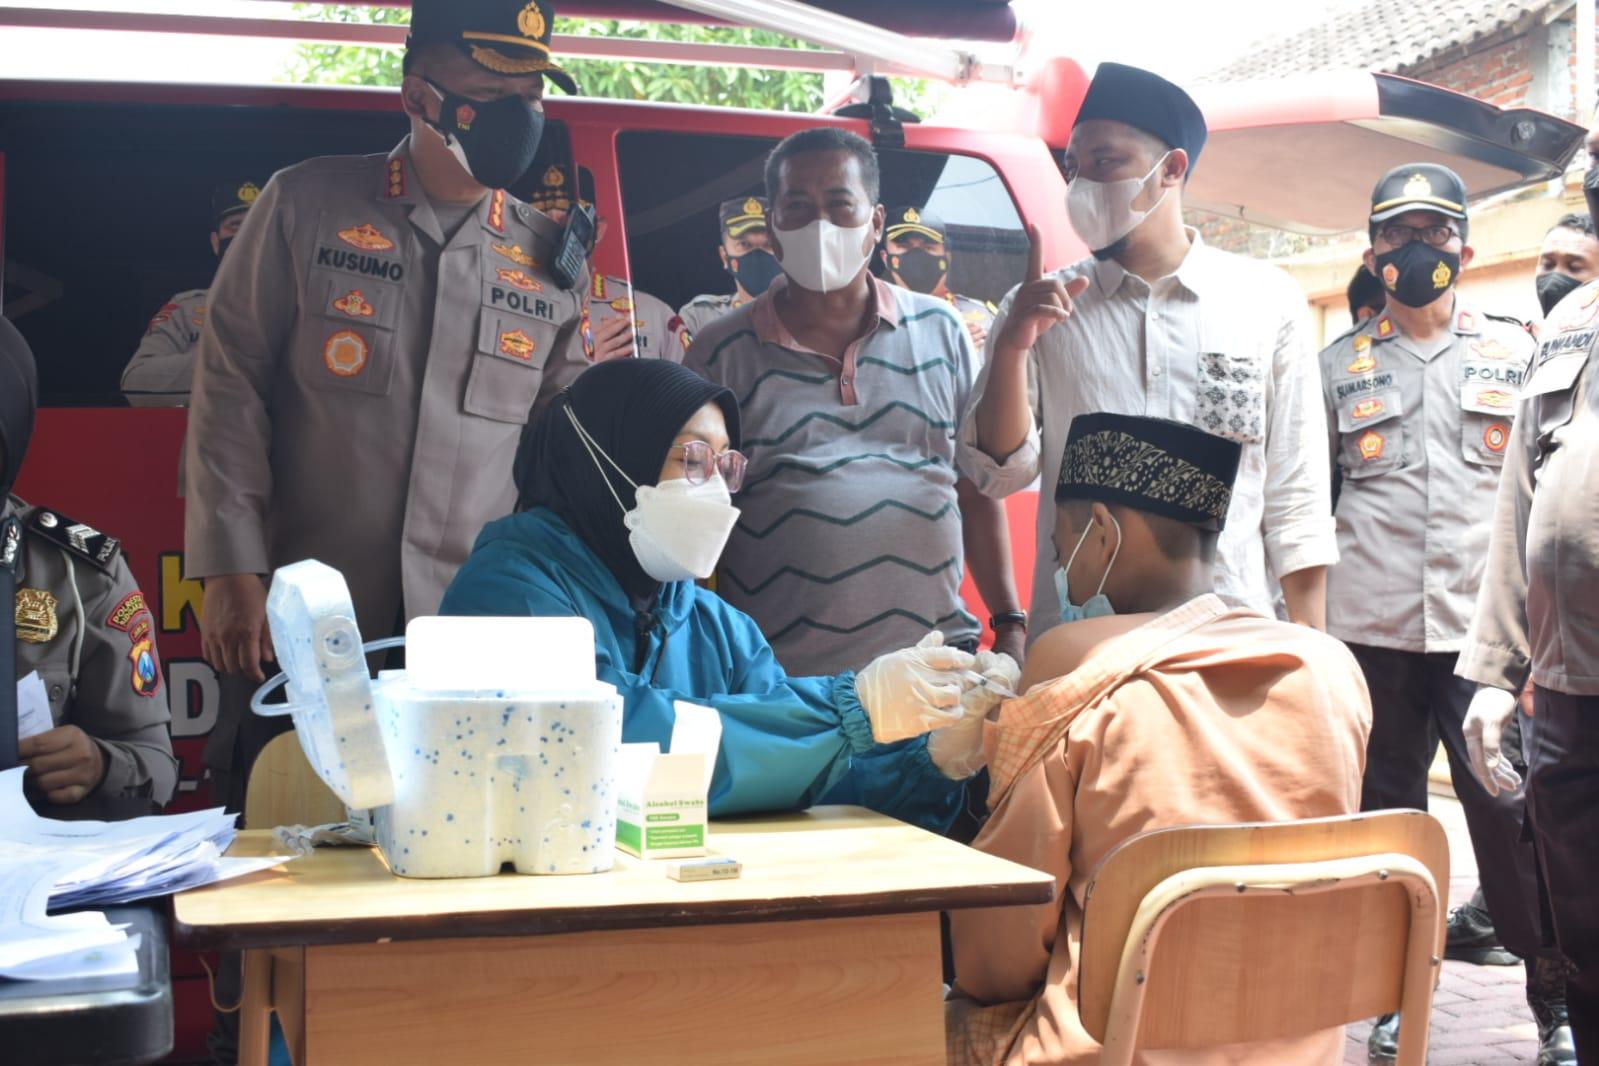 Kapolresta Sidoarjo Targetkan Vaksinasi Keliling Sehari Enam Desa | Memo Surabaya